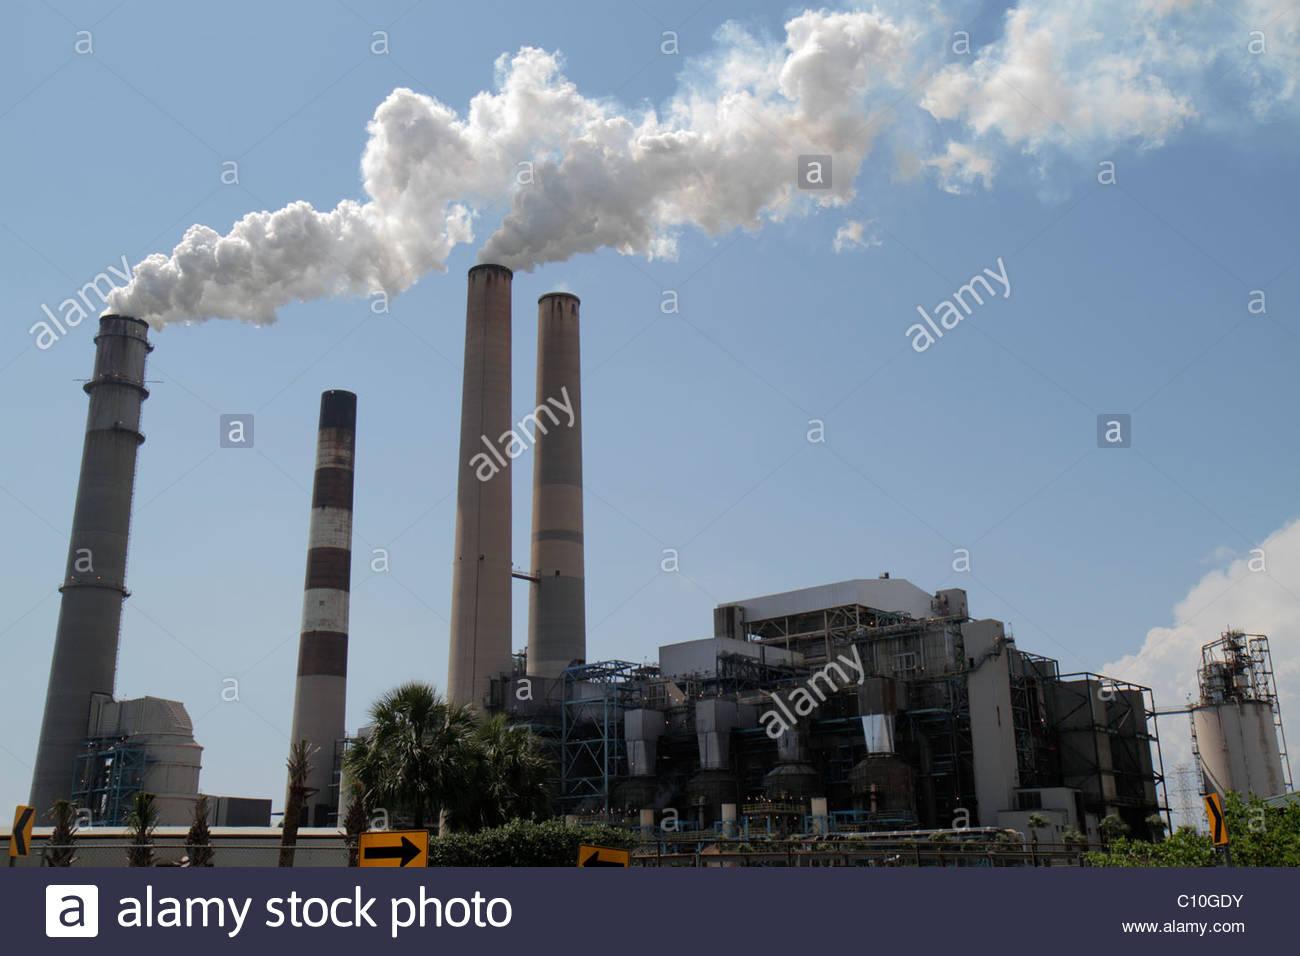 Tampa Florida Tampa Electric Co TECO smokestacks pollution - Stock Image